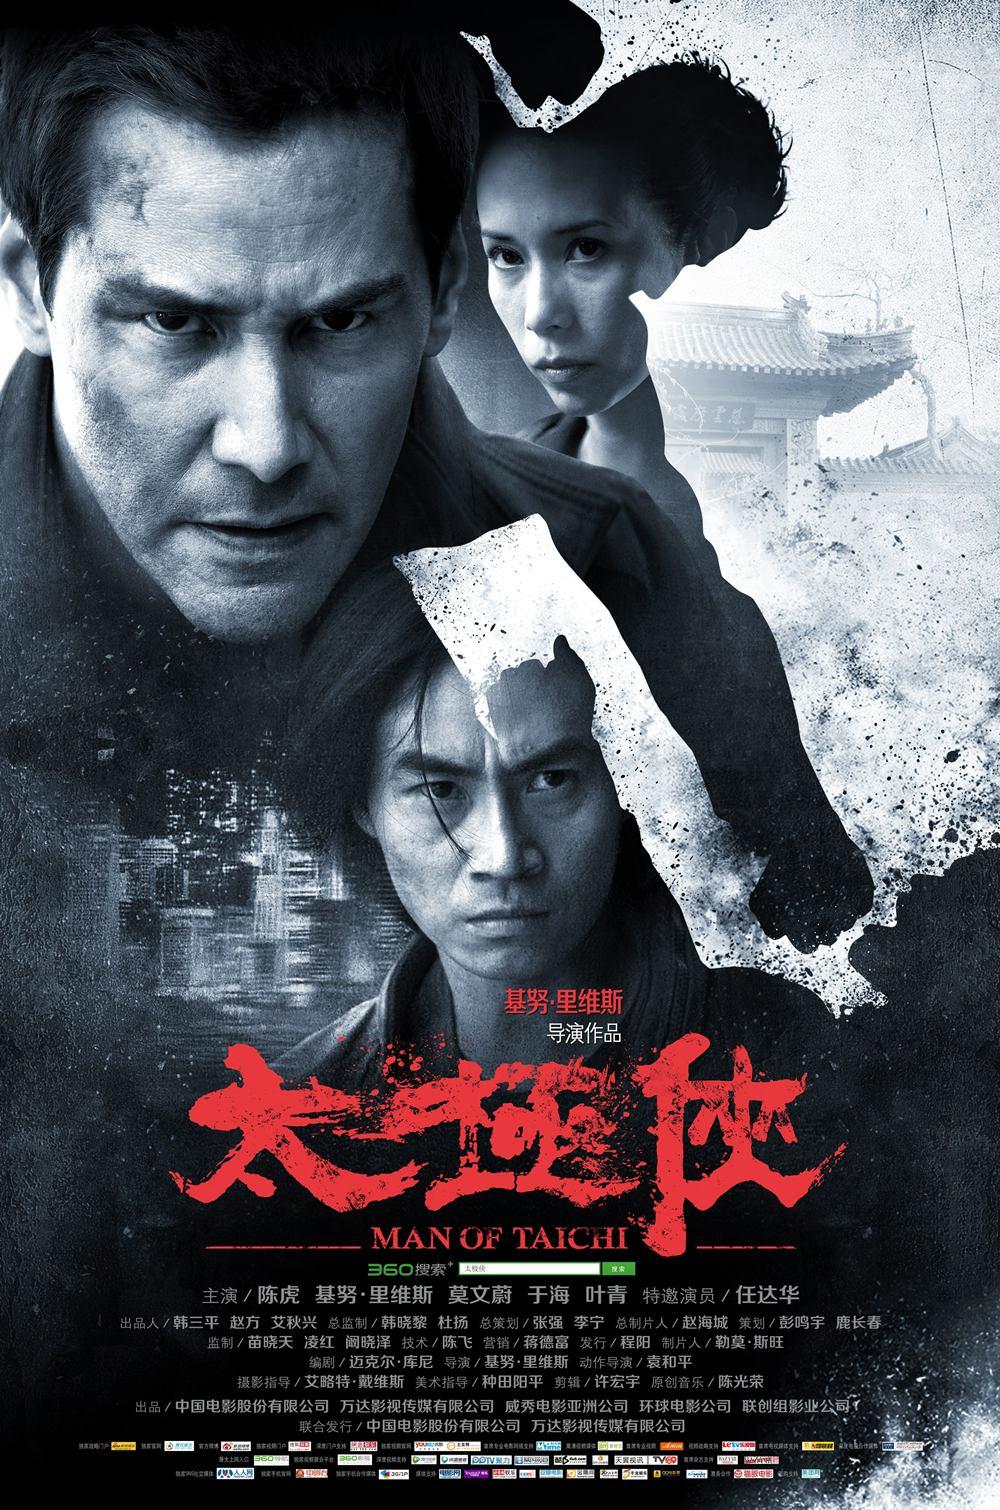 O Homem do Tai Chi [Dub] – IMDB 6.1